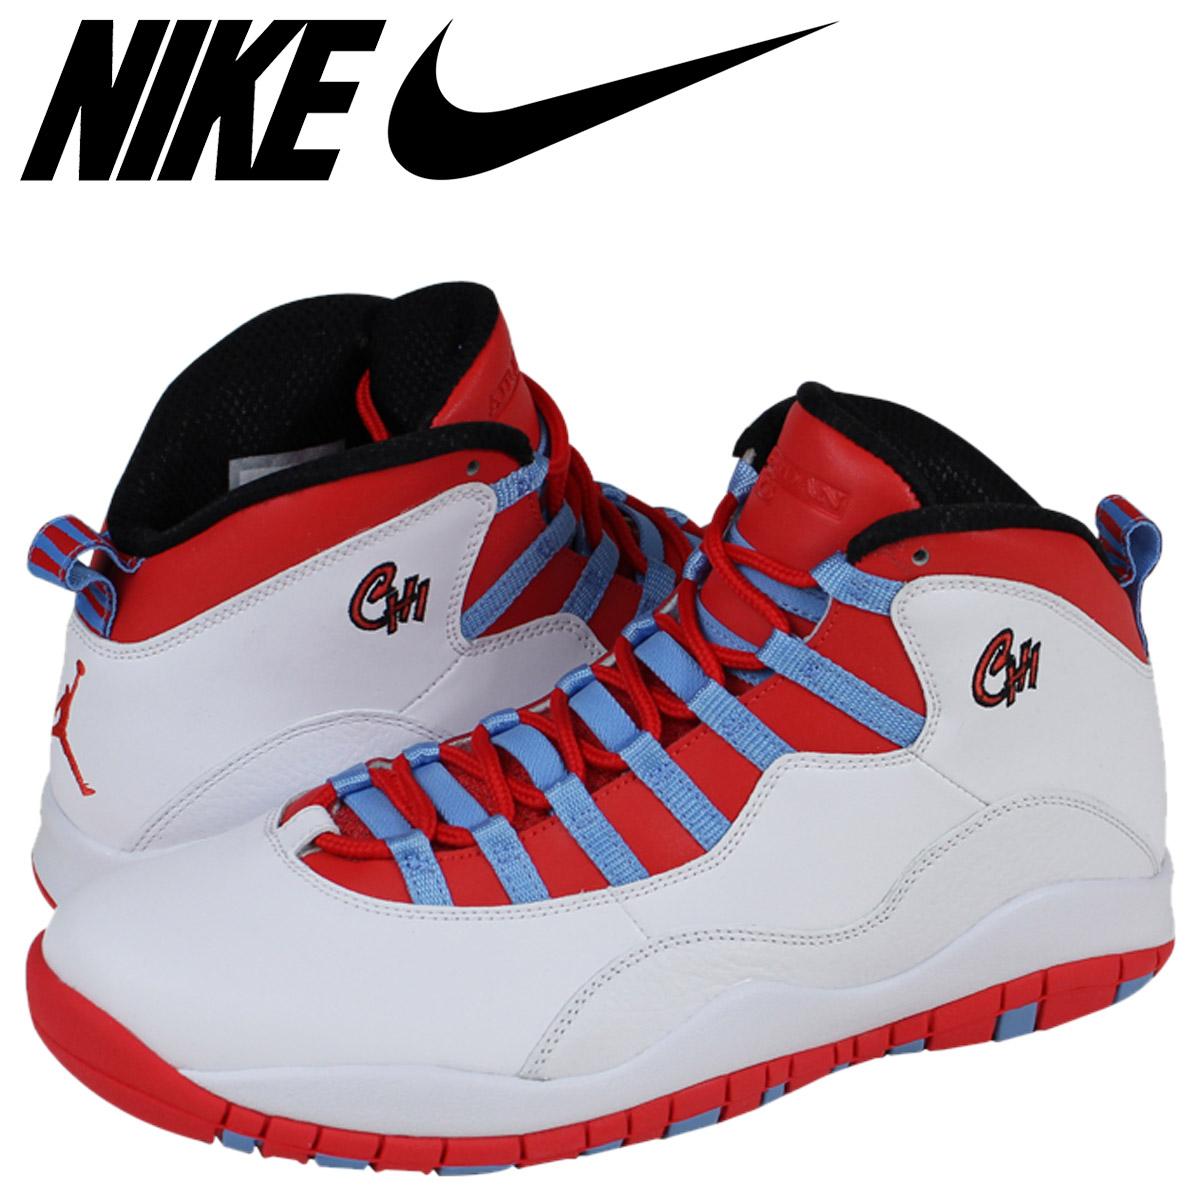 ac994fc8932 NIKE Nike Air Jordan sneakers AIR JORDAN 10 RETRO CHICAGO Air Jordan 10  retro 310805 ...